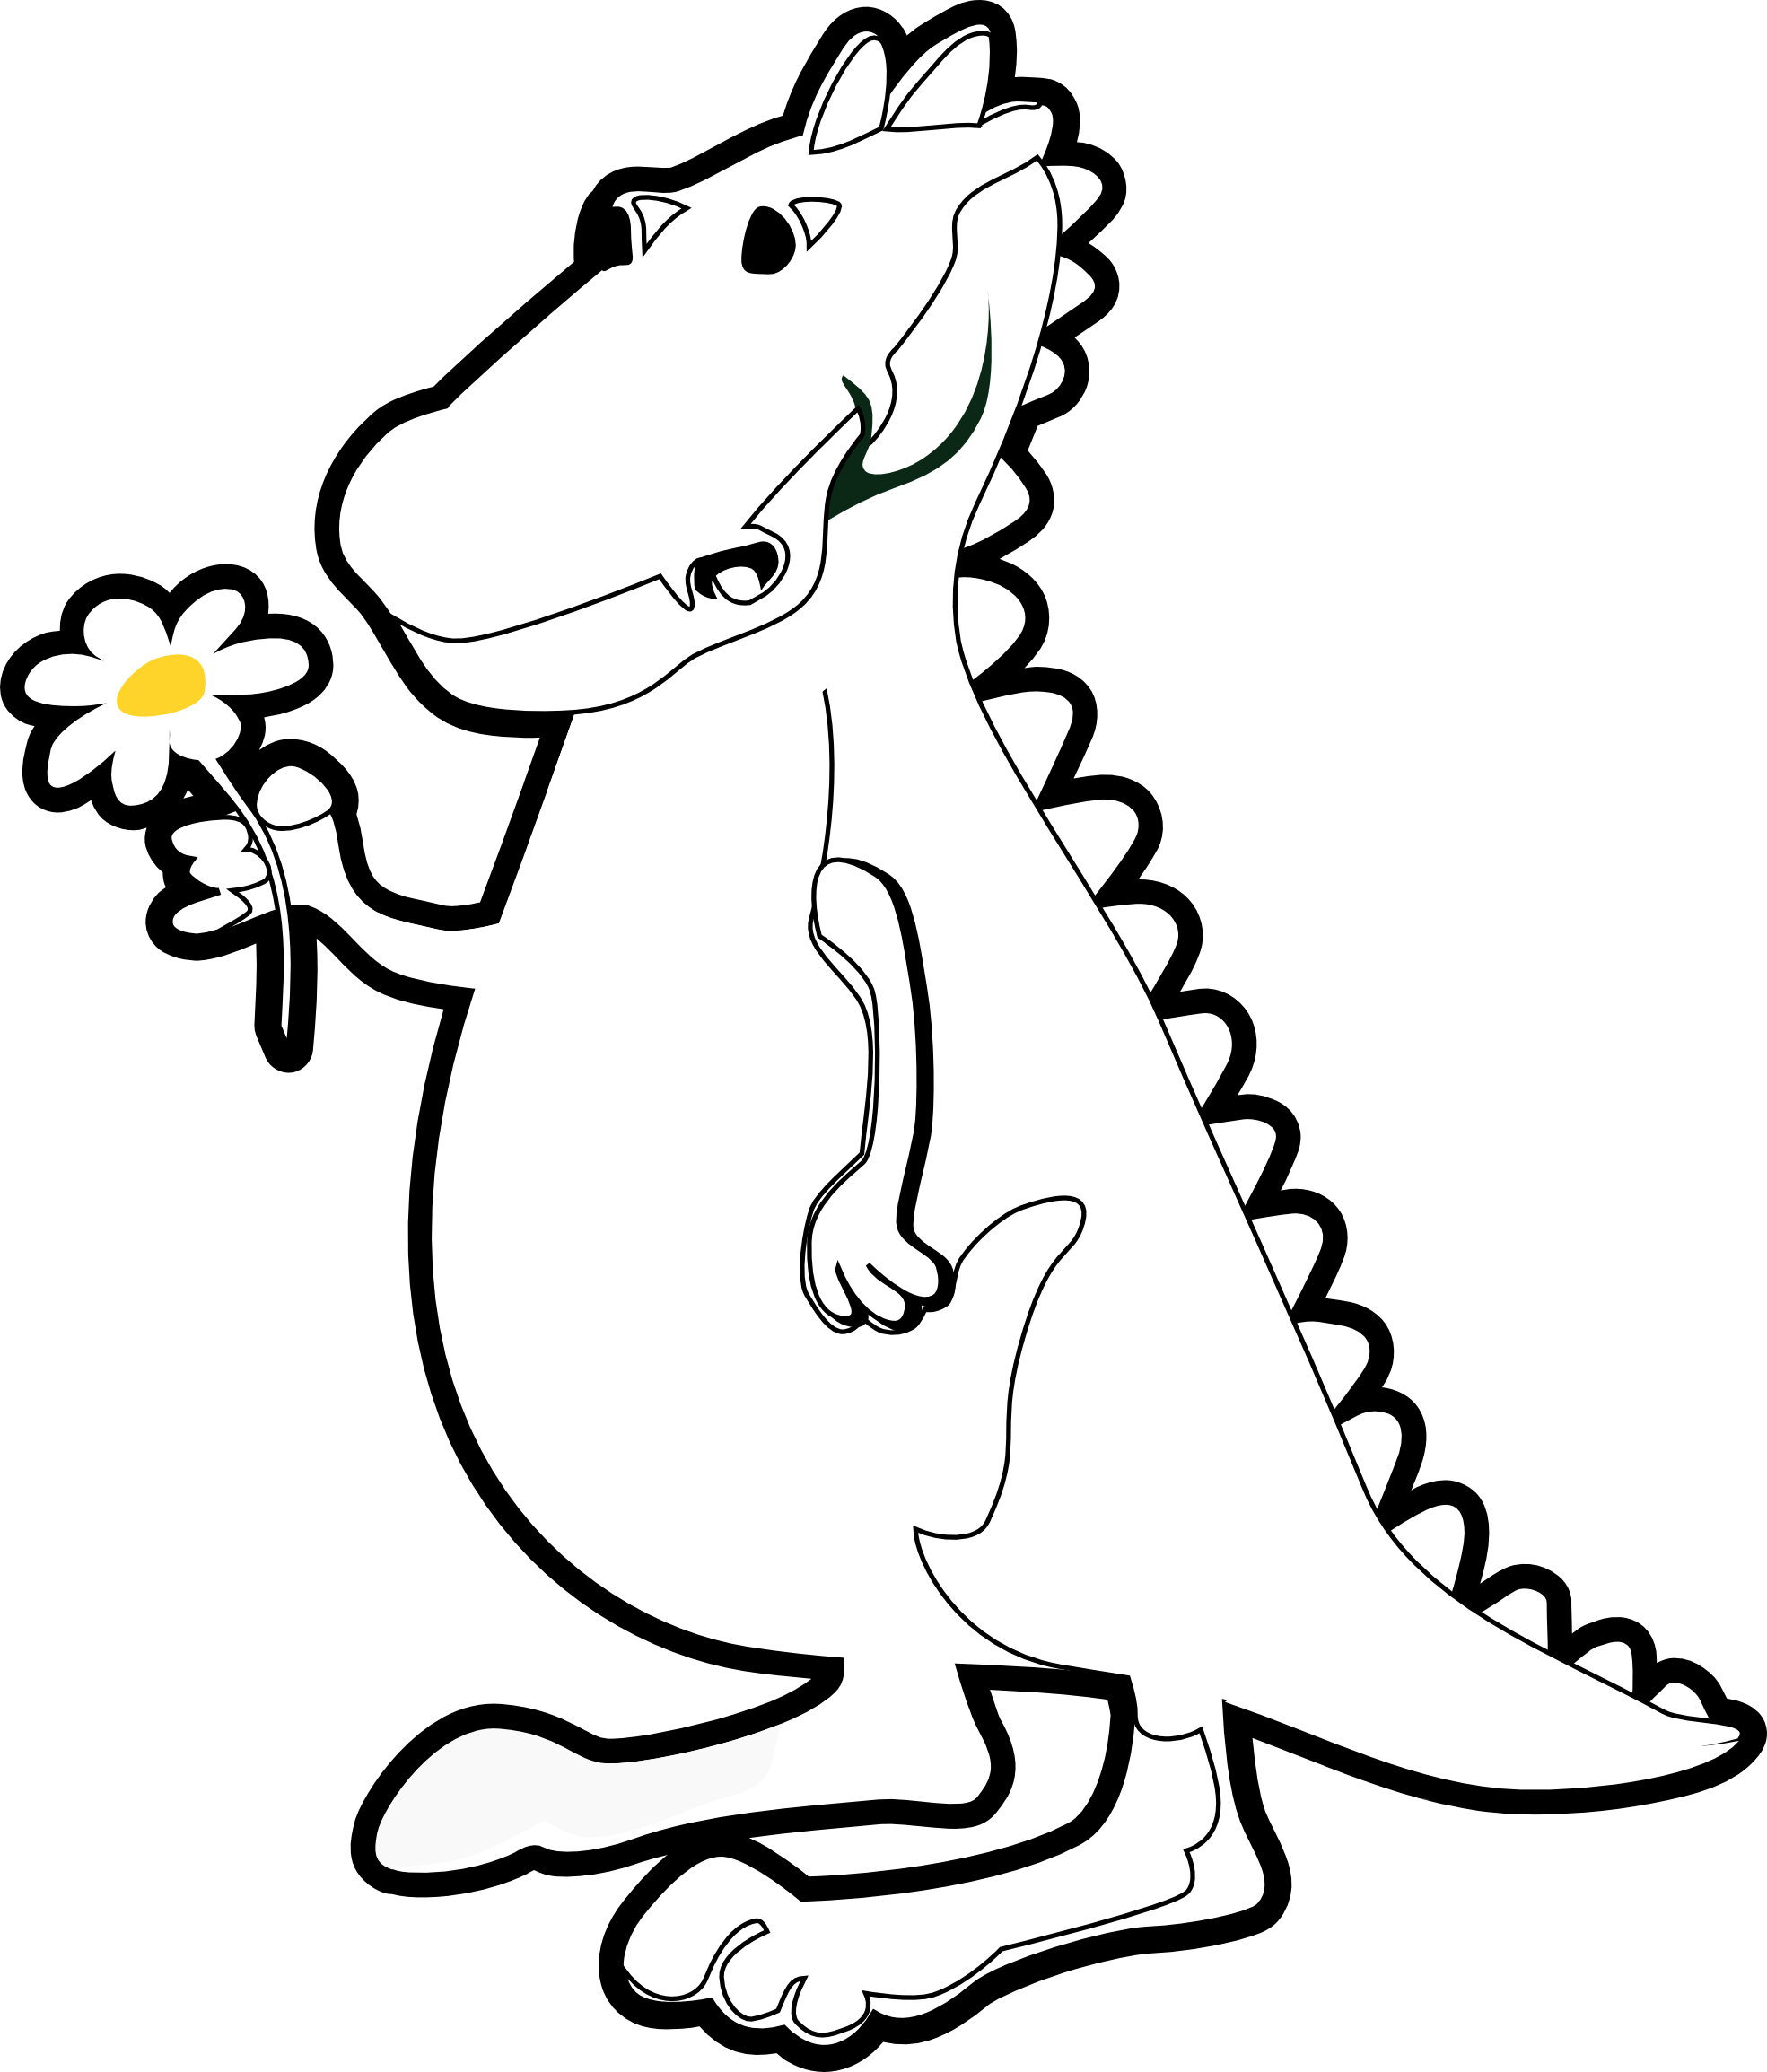 Dinosaur skeleton clip art. Dragon clipart reading